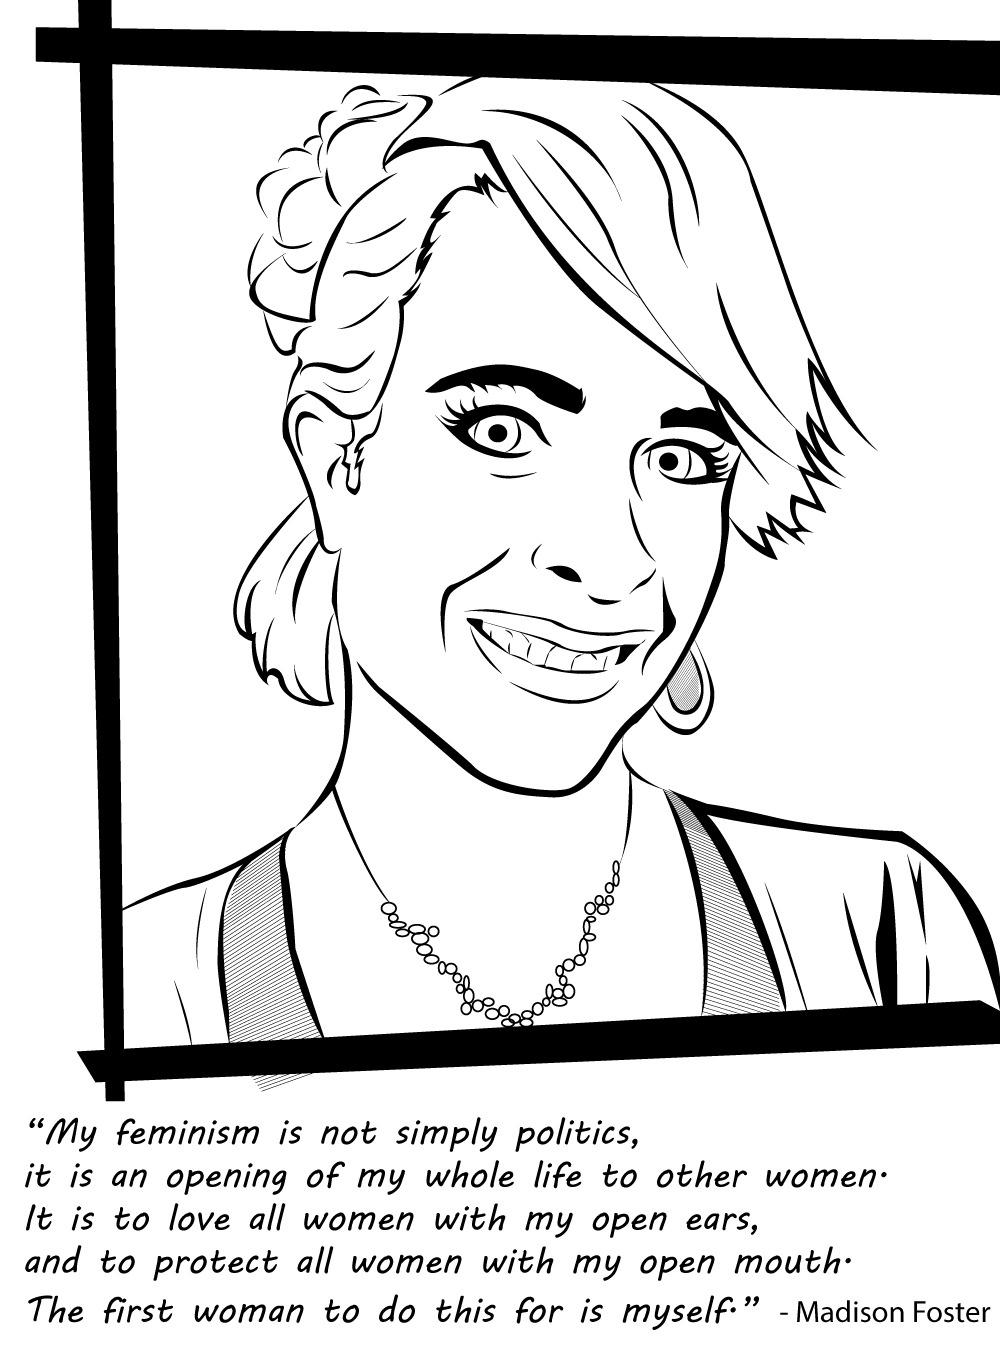 Badass Feminist Coloring Book  By Feminist Writer Ijeoma Oluo